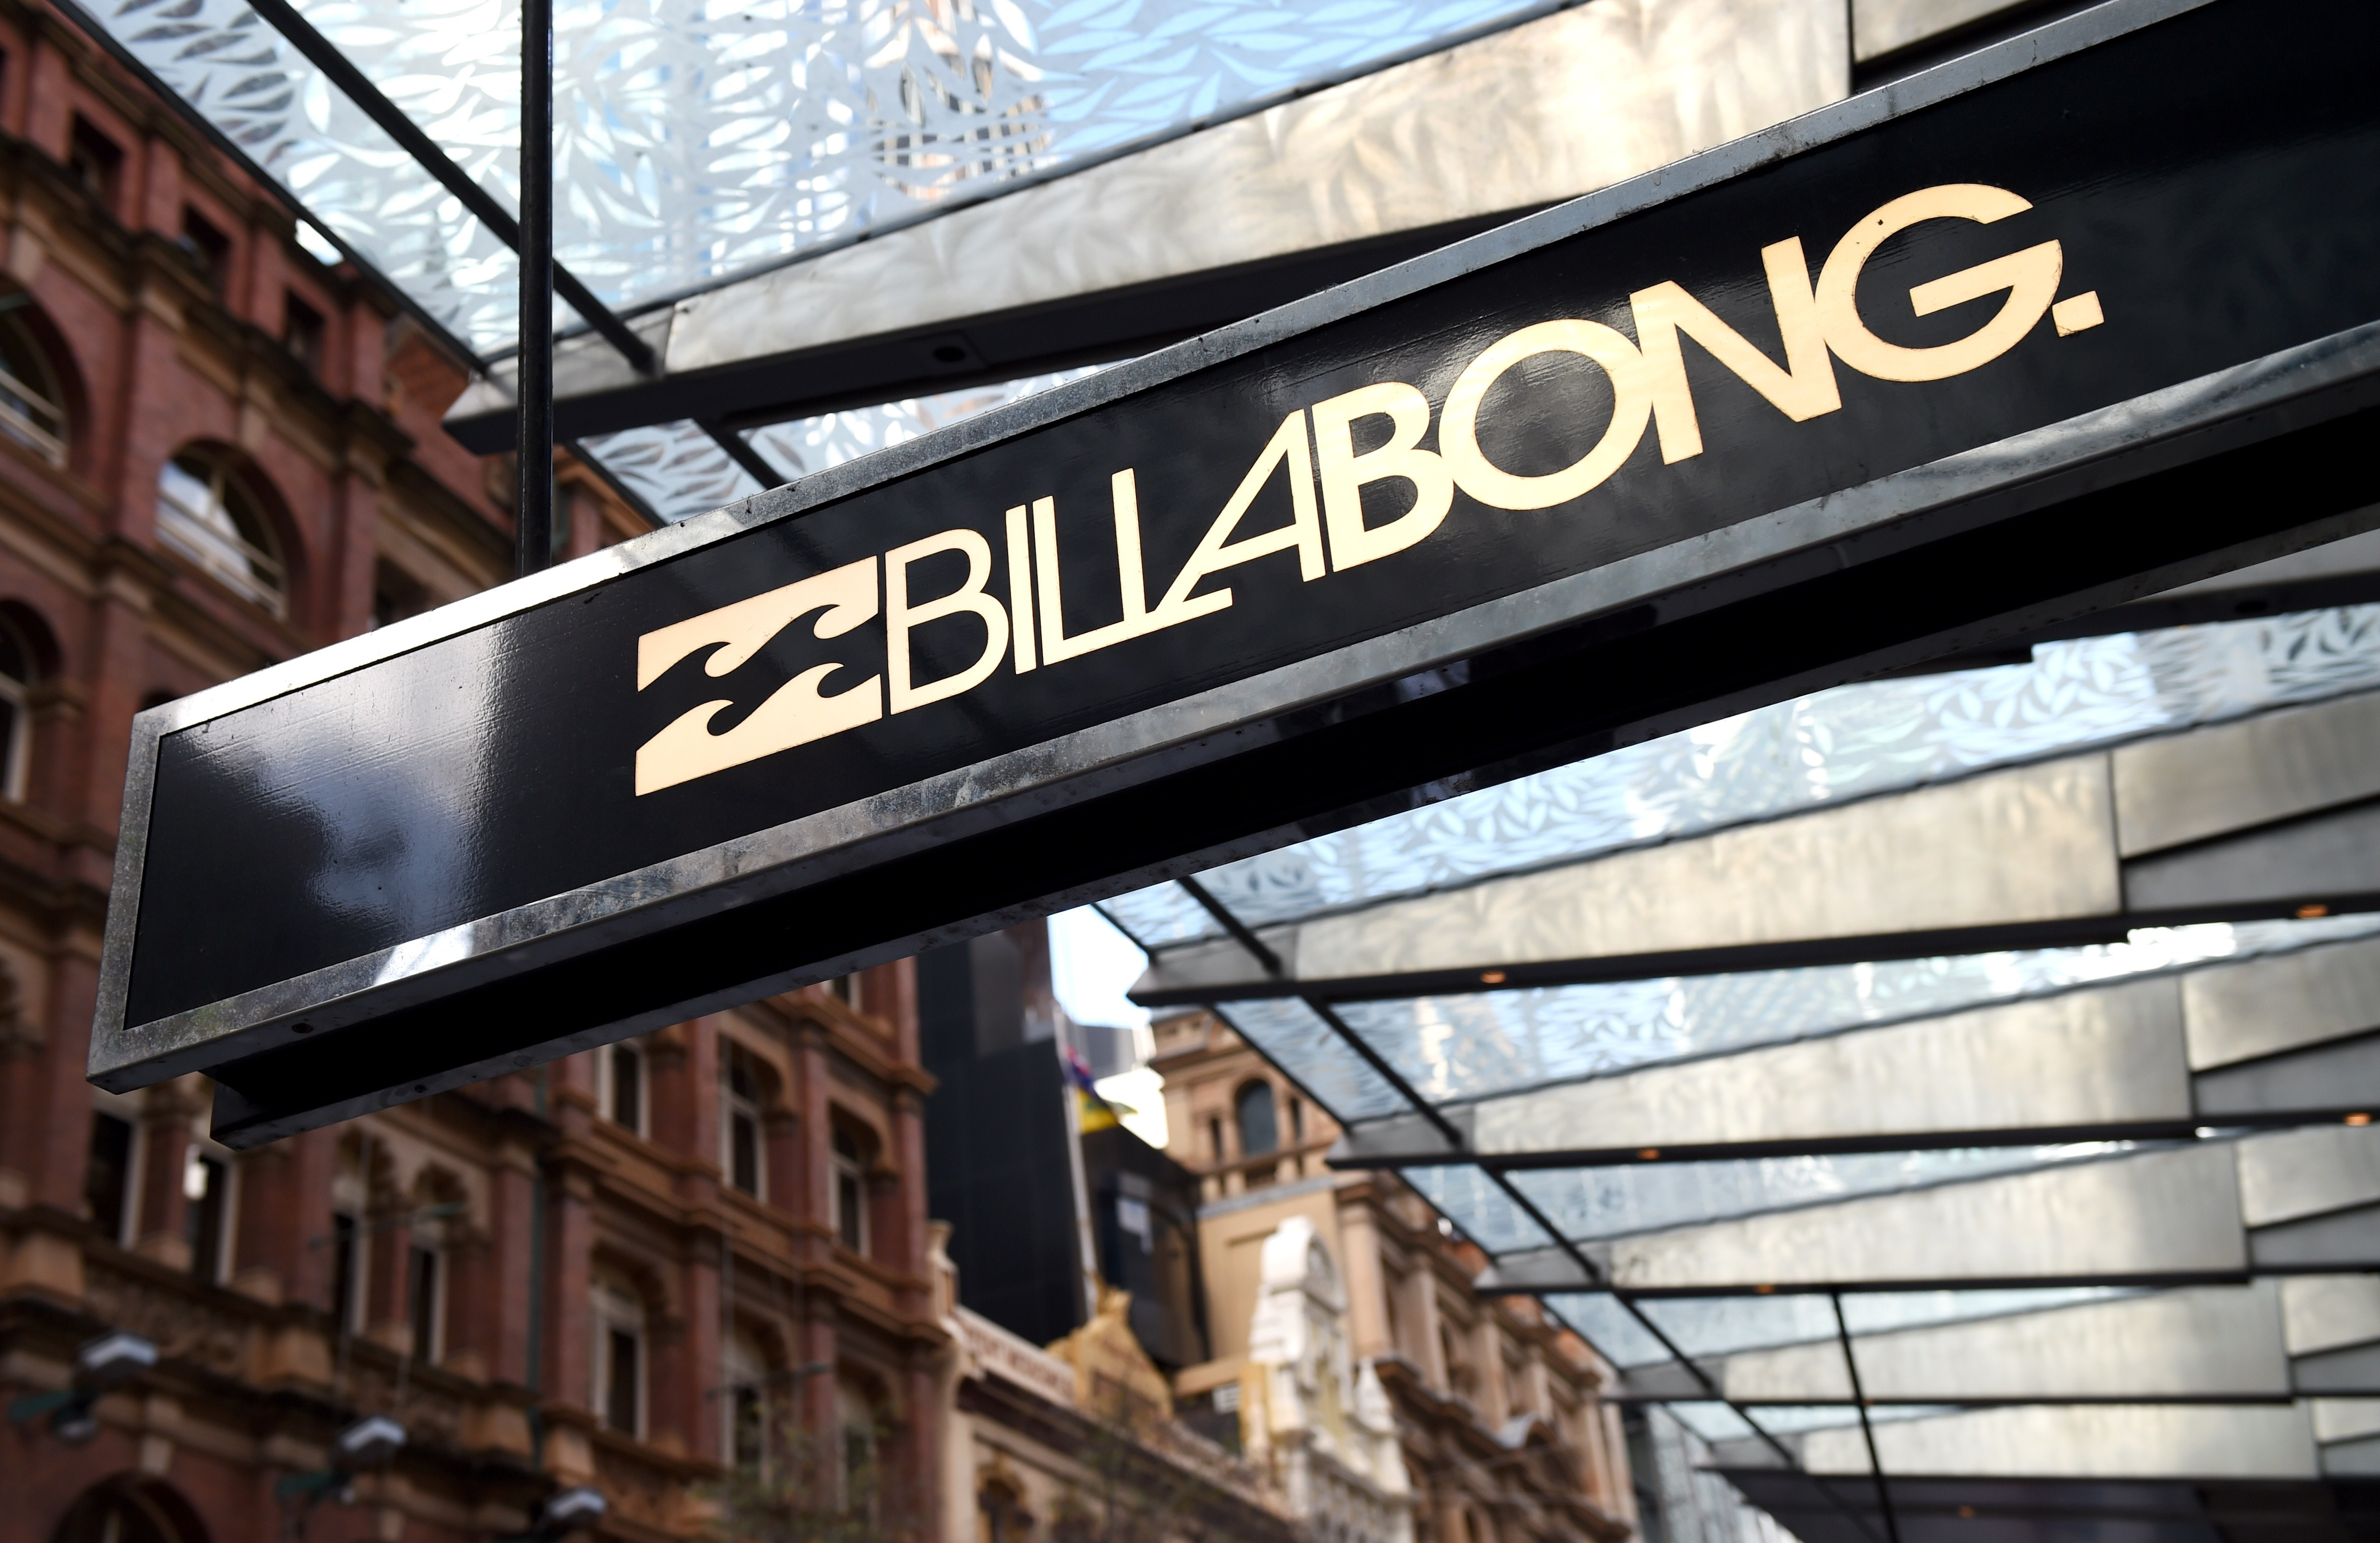 AUSTRALIA-CLOTHING-RETAIL-BILLABONG